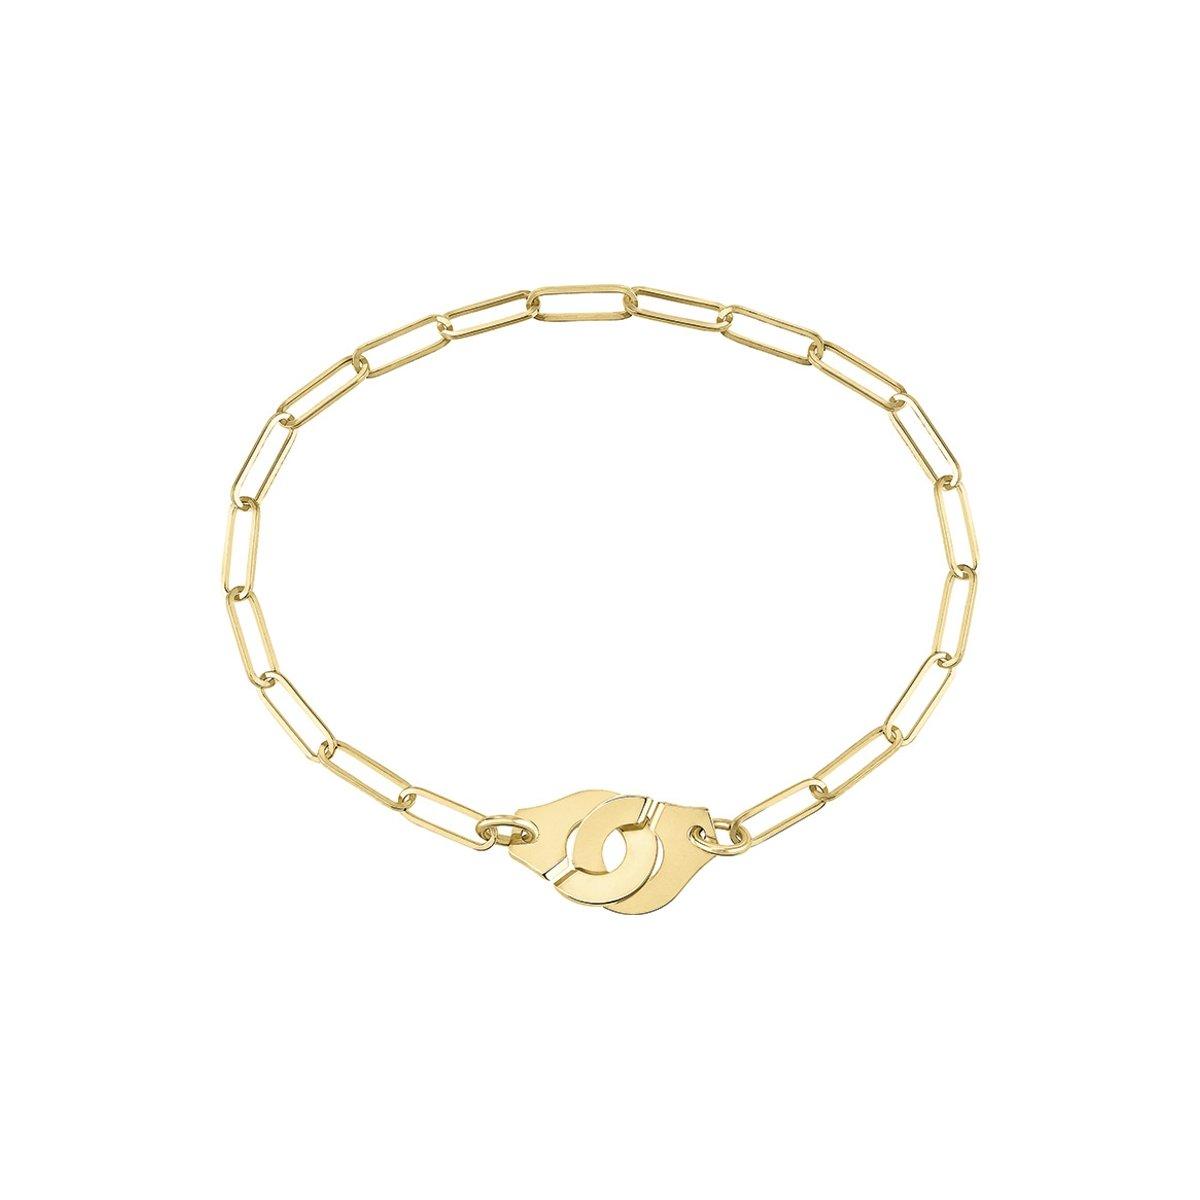 Bracelet dinh van Menottes dinh van R10 en or jaune vue 1